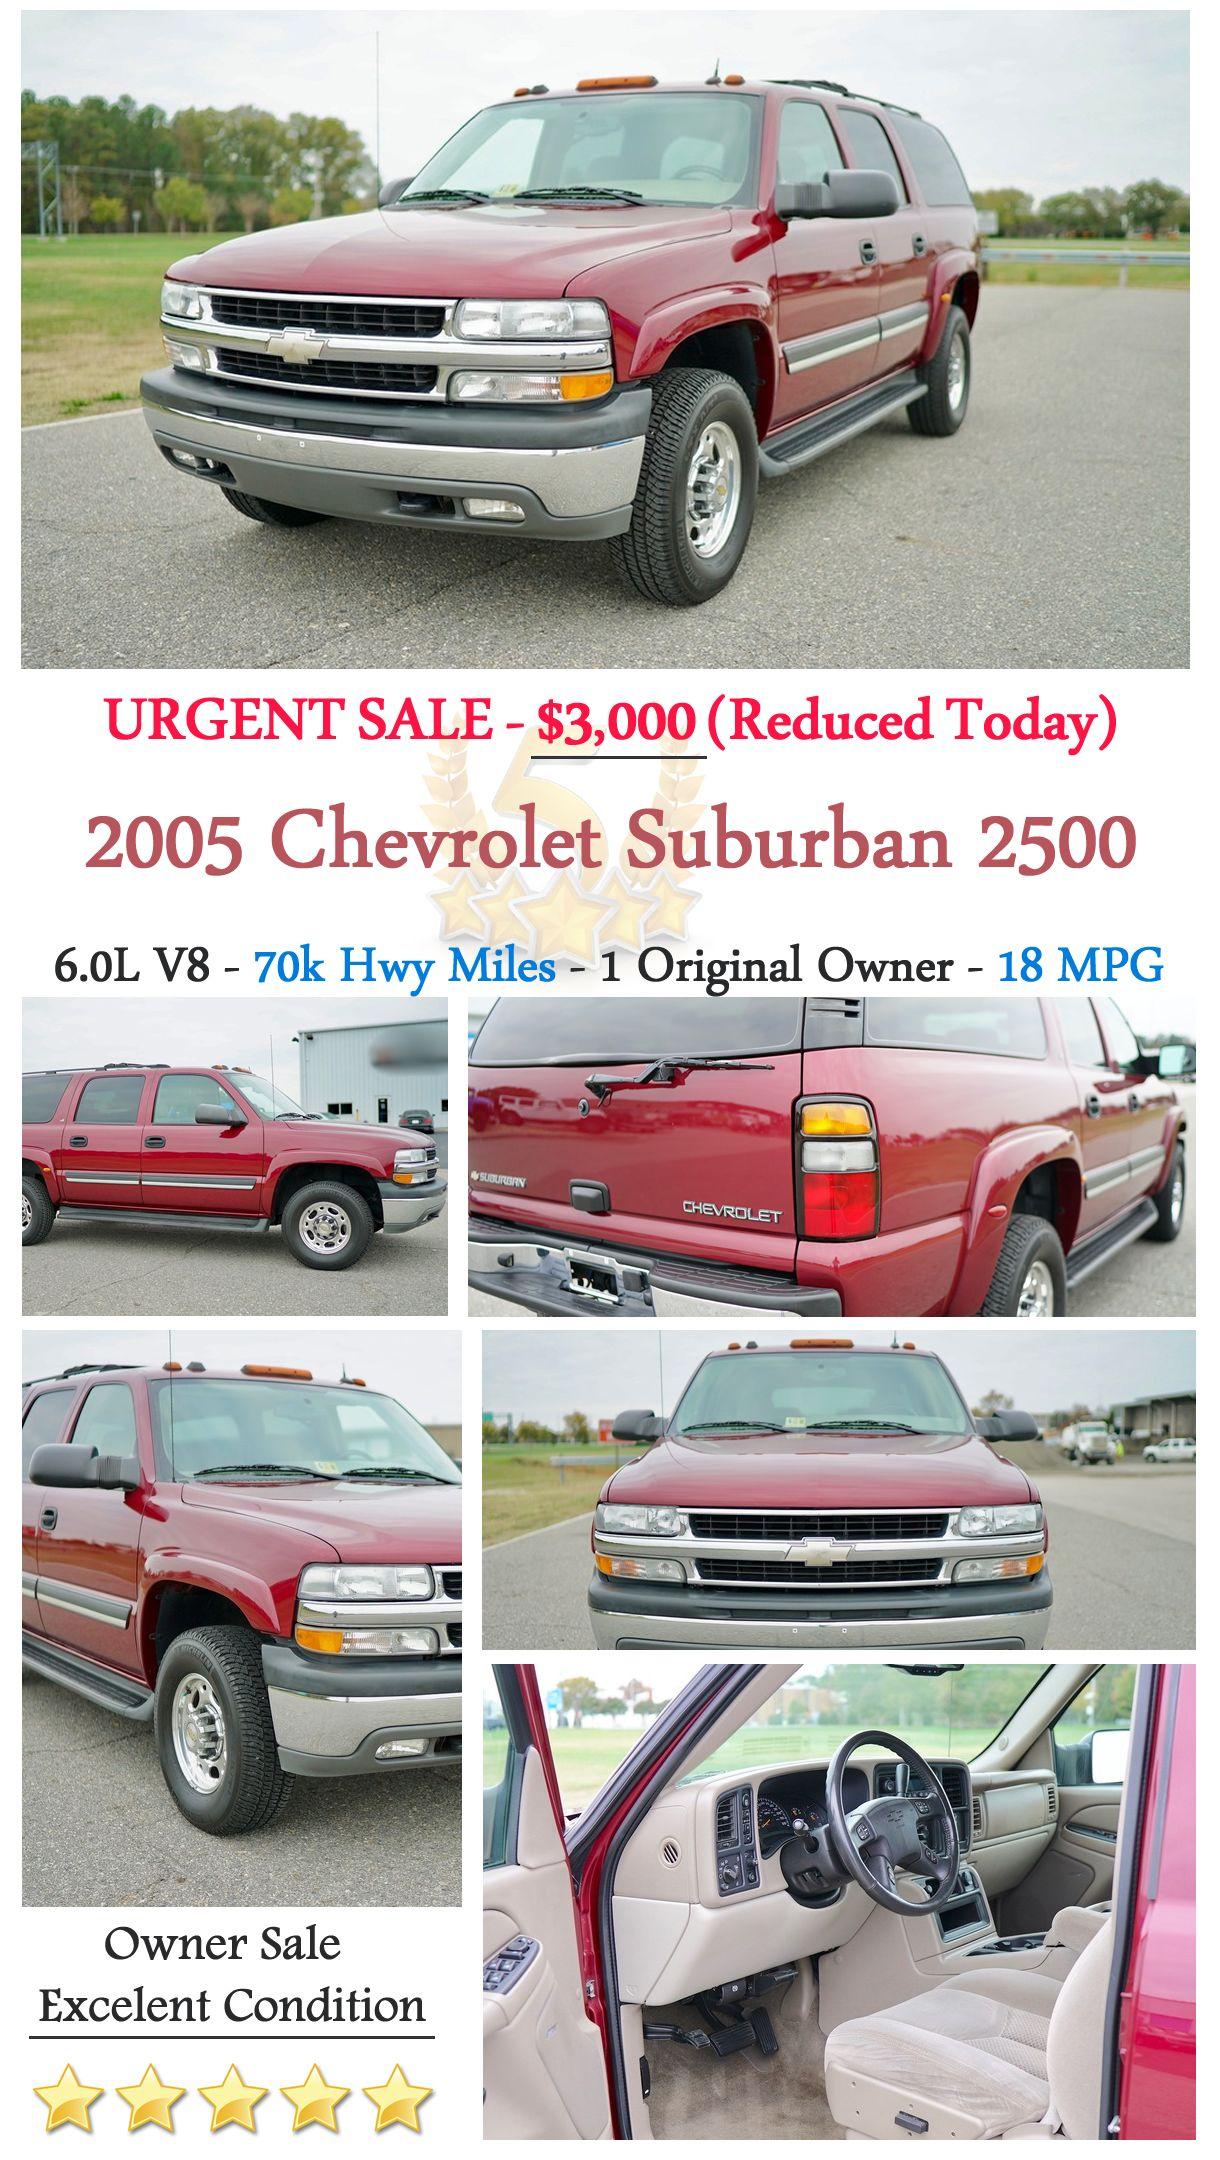 Pin By Robert Lupton On Best Deals Autos Chevrolet Suburban Chevrolet Suburban